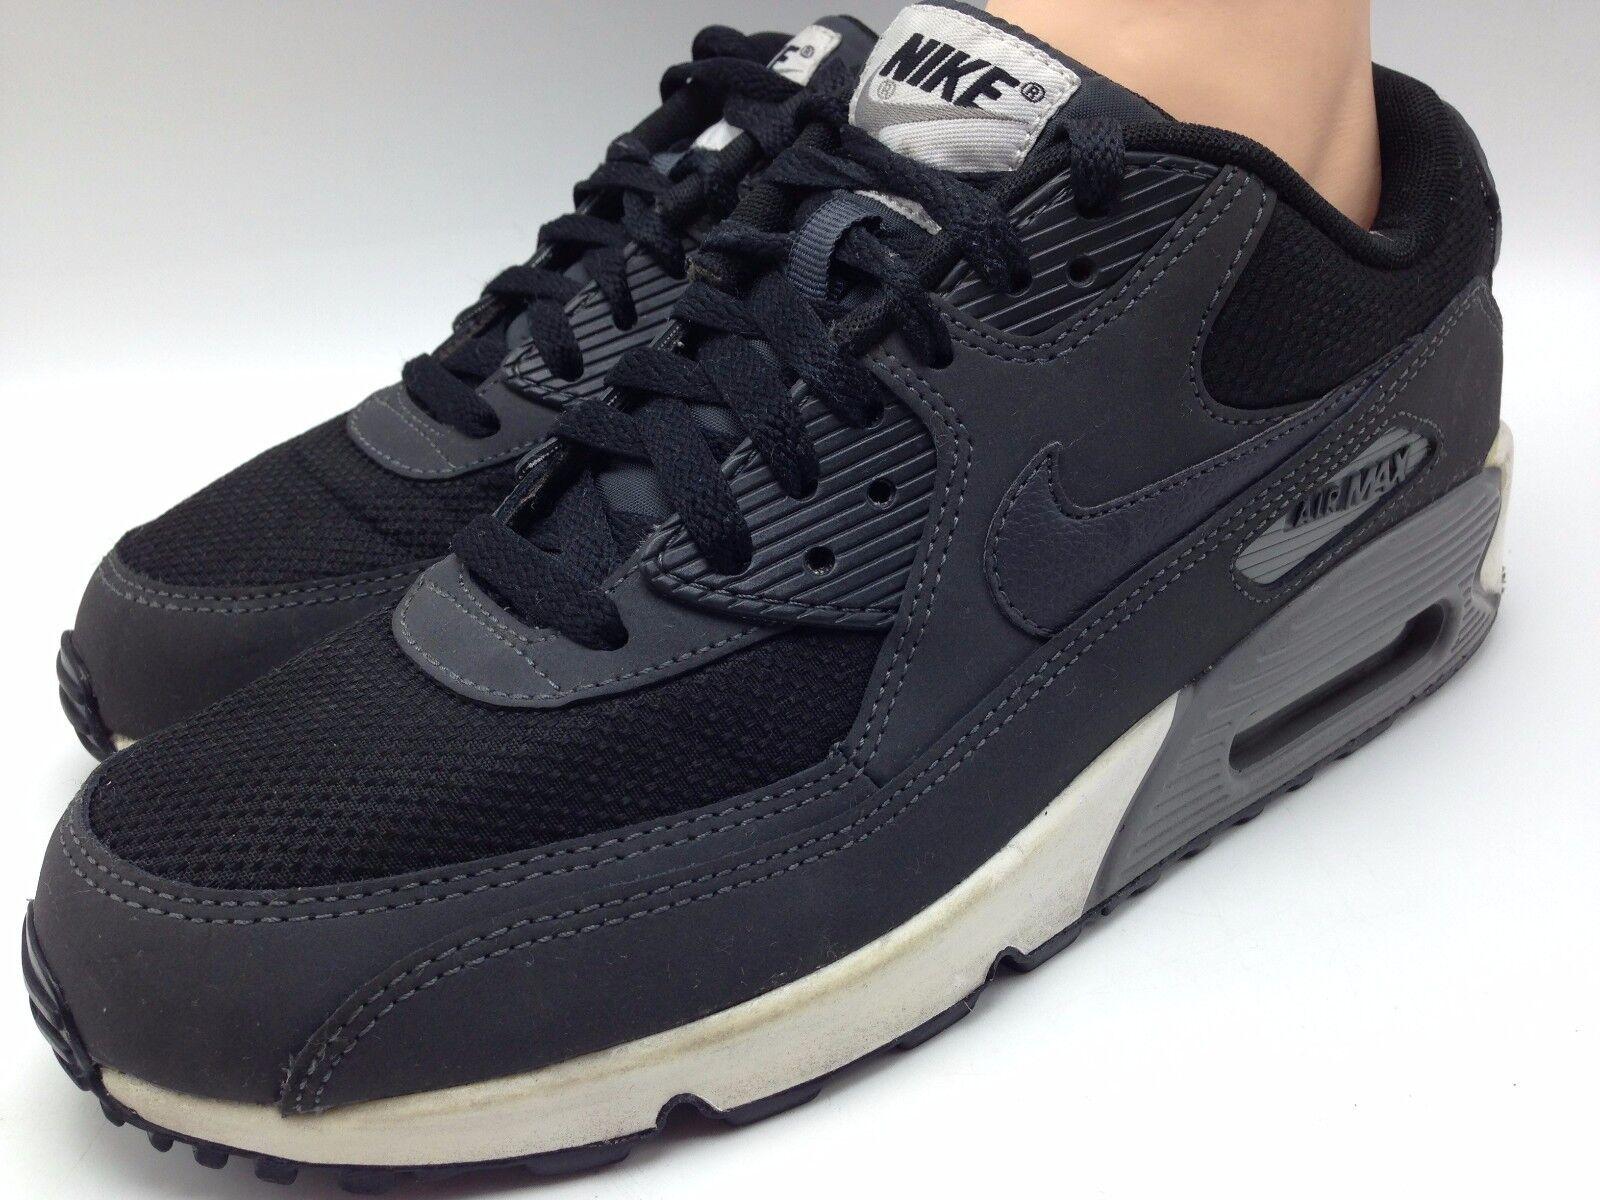 3b10 nike air max sneaker frauen handel laufen gehen joggen frauen sneaker schuhe größe 8,5 dc56a5